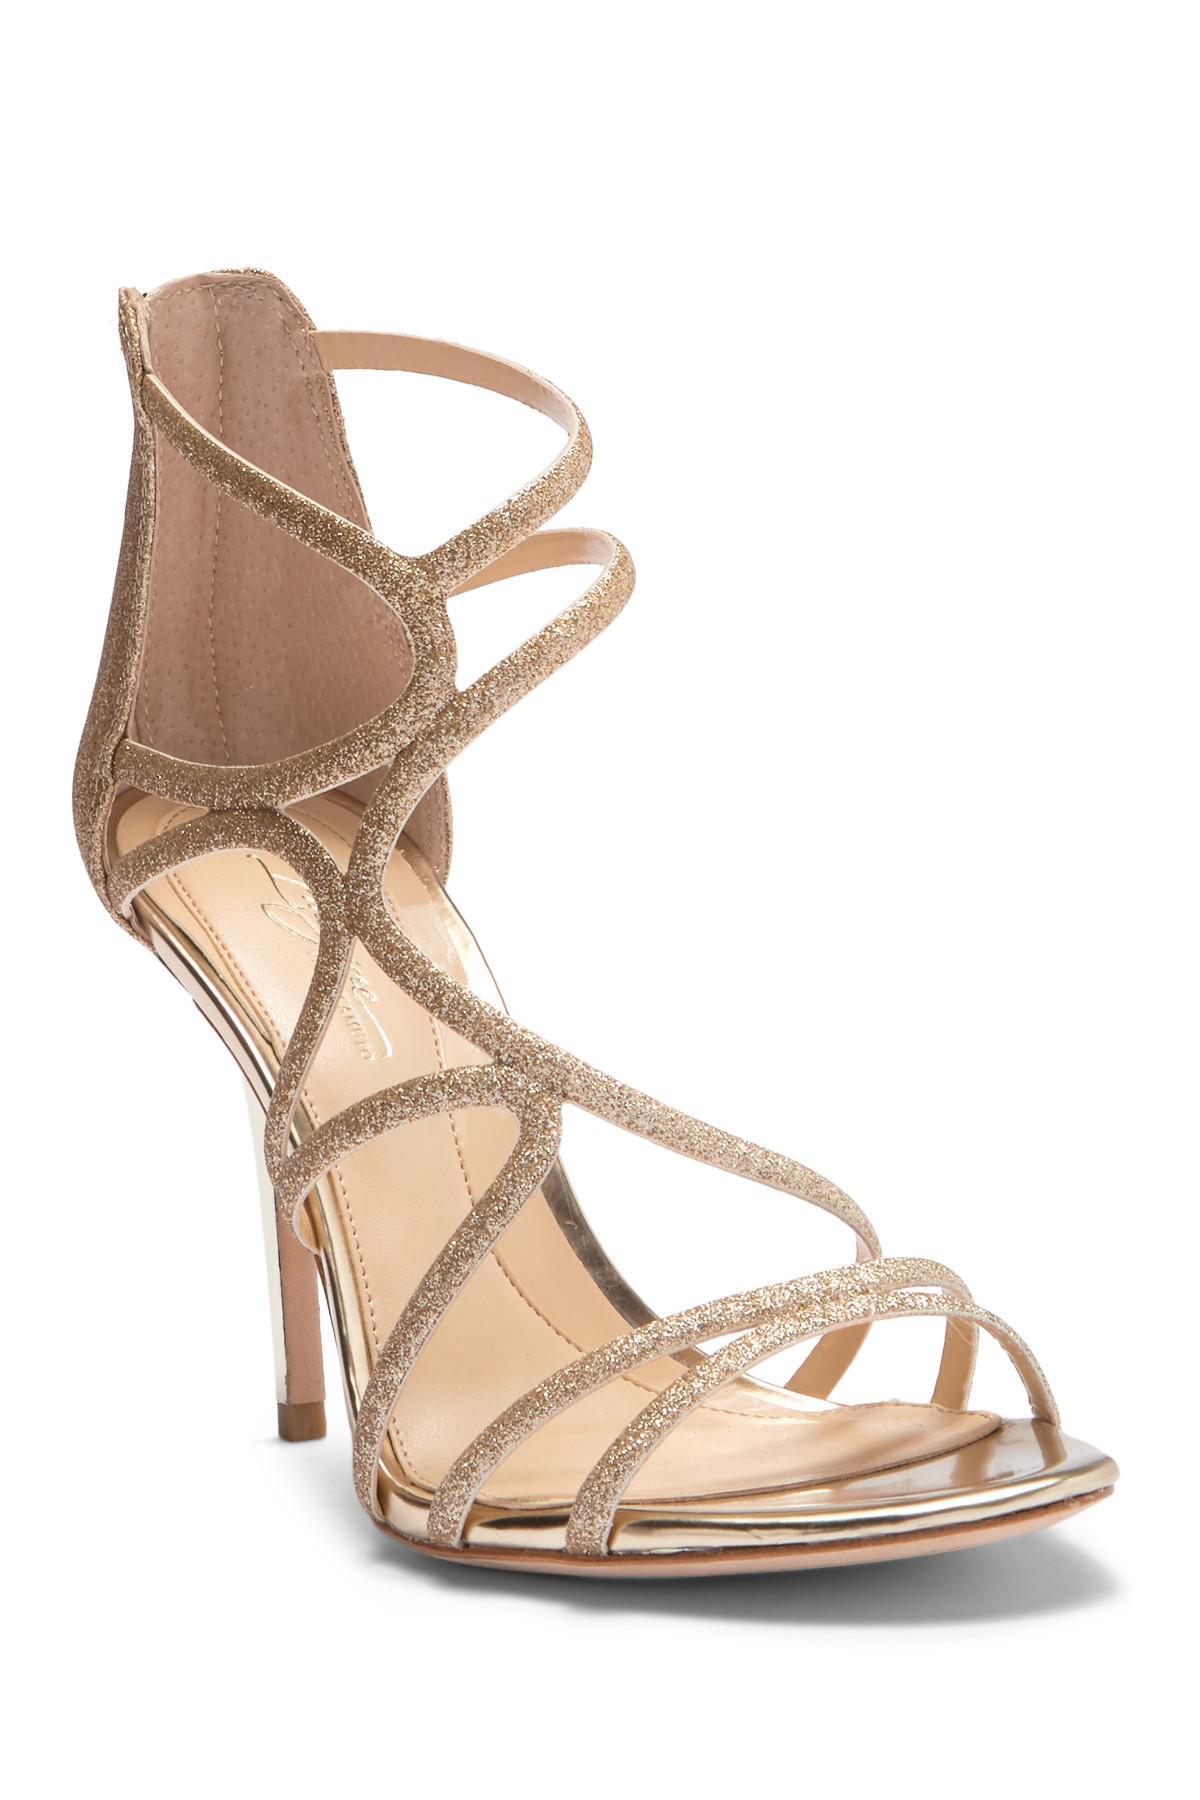 3fc1dce28b8 Lyst - Imagine Vince Camuto  ranee  Dress Sandal (women) - Save 47%